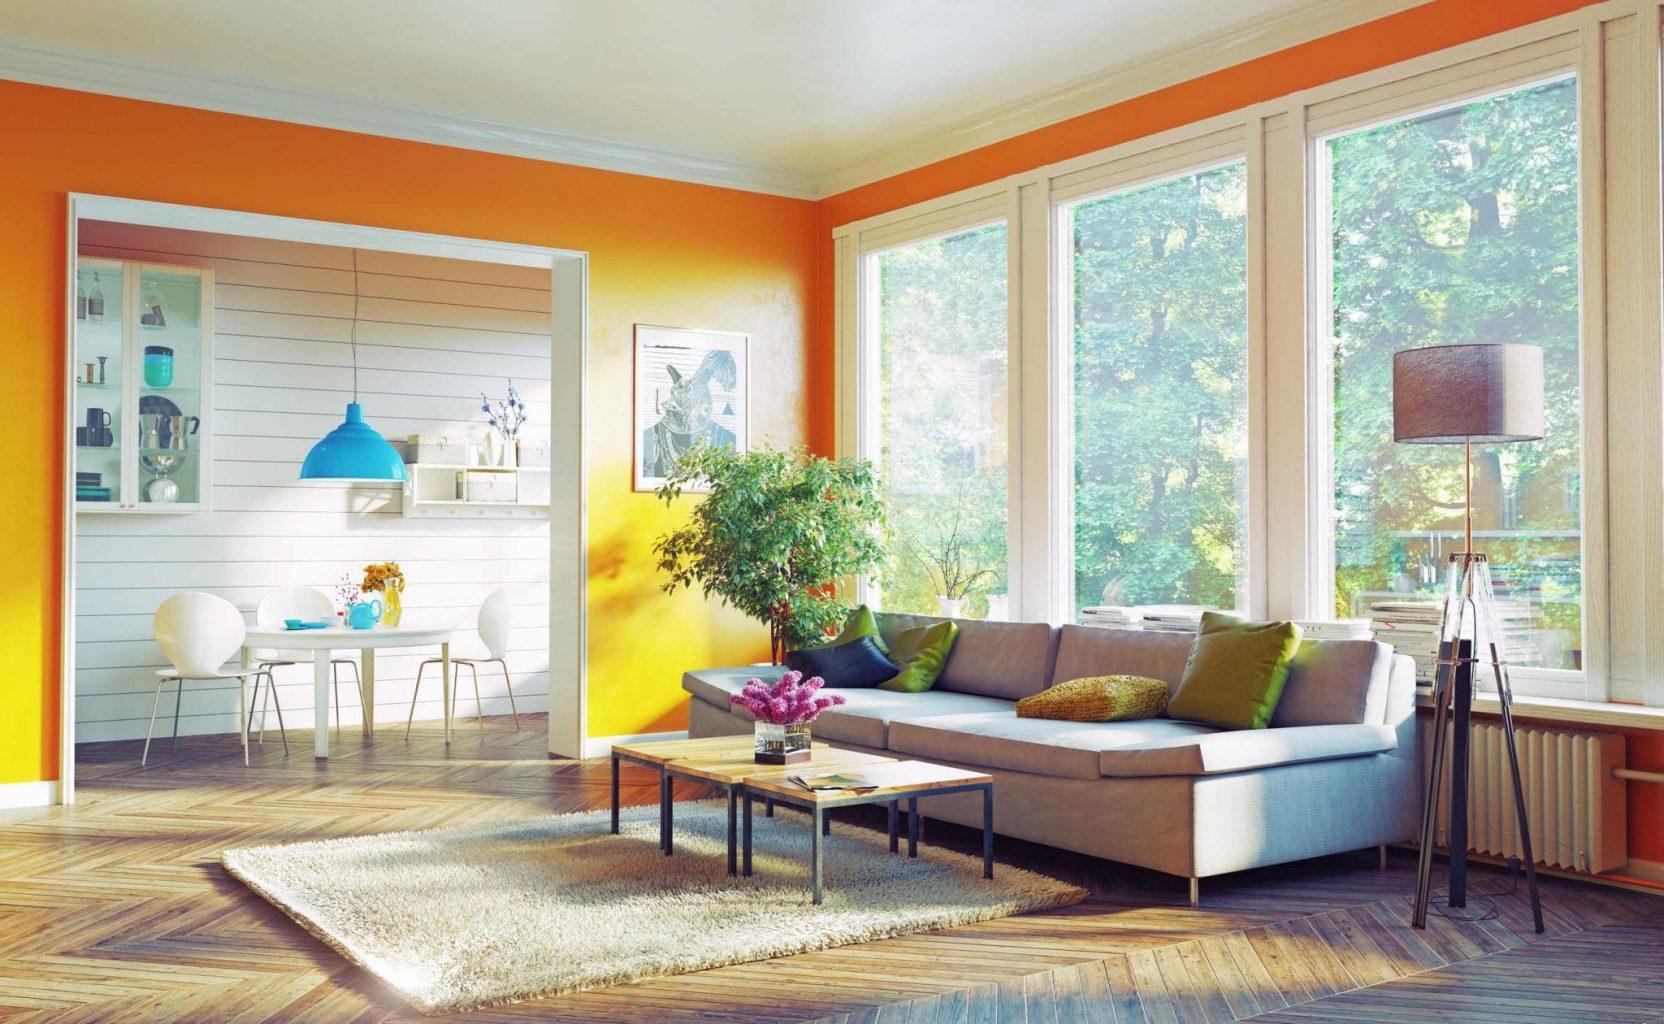 Top Benefits of Residential Window Tinting in Iowa City & Cedar Rapids, Iowa